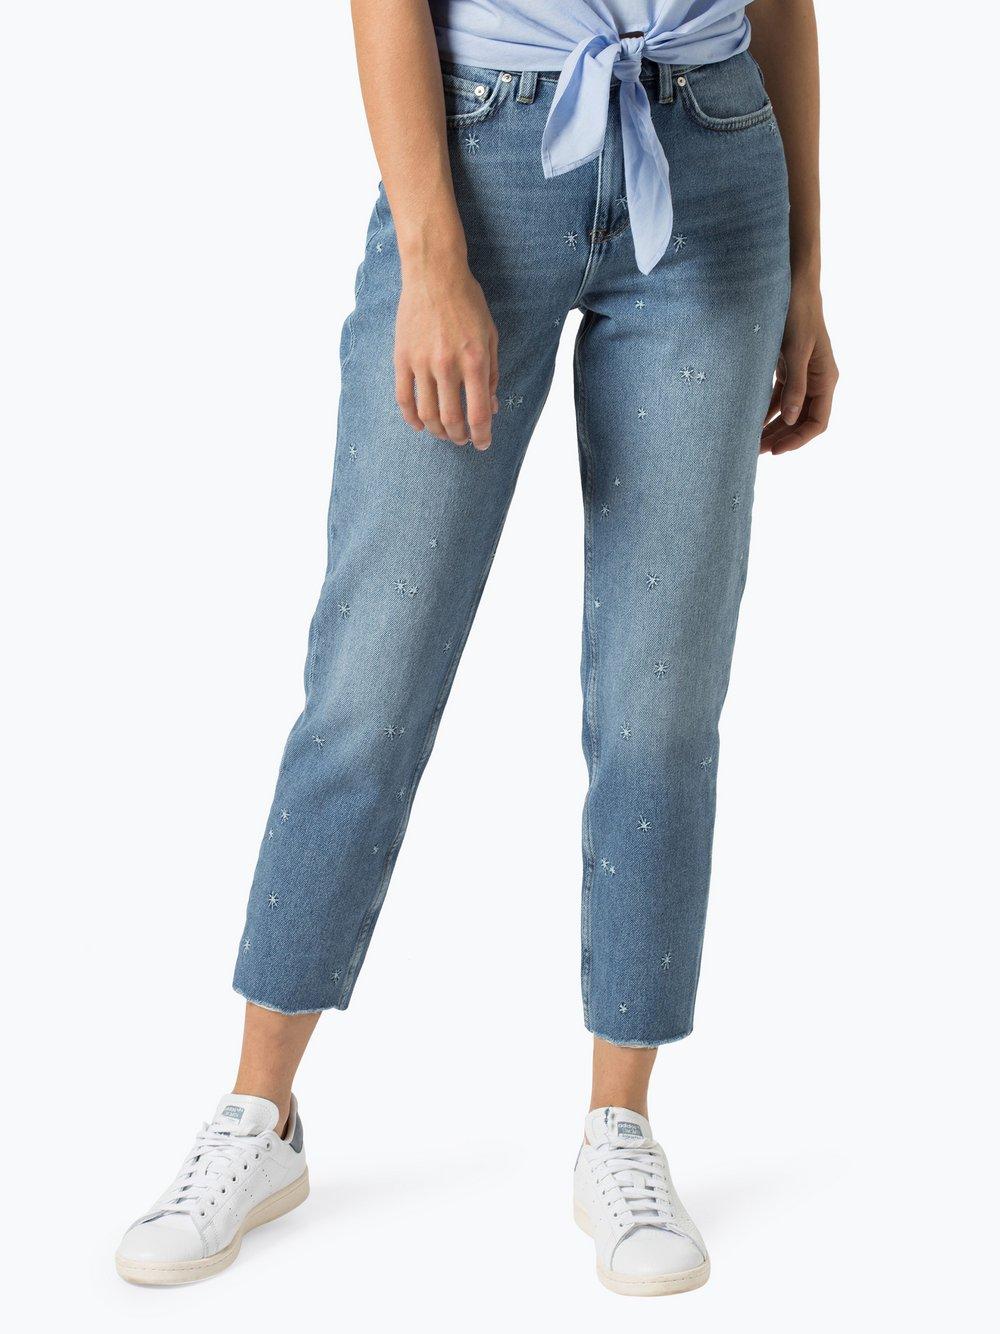 Tommy Hilfiger Damen Jeans Gramercy online kaufen | PEEK